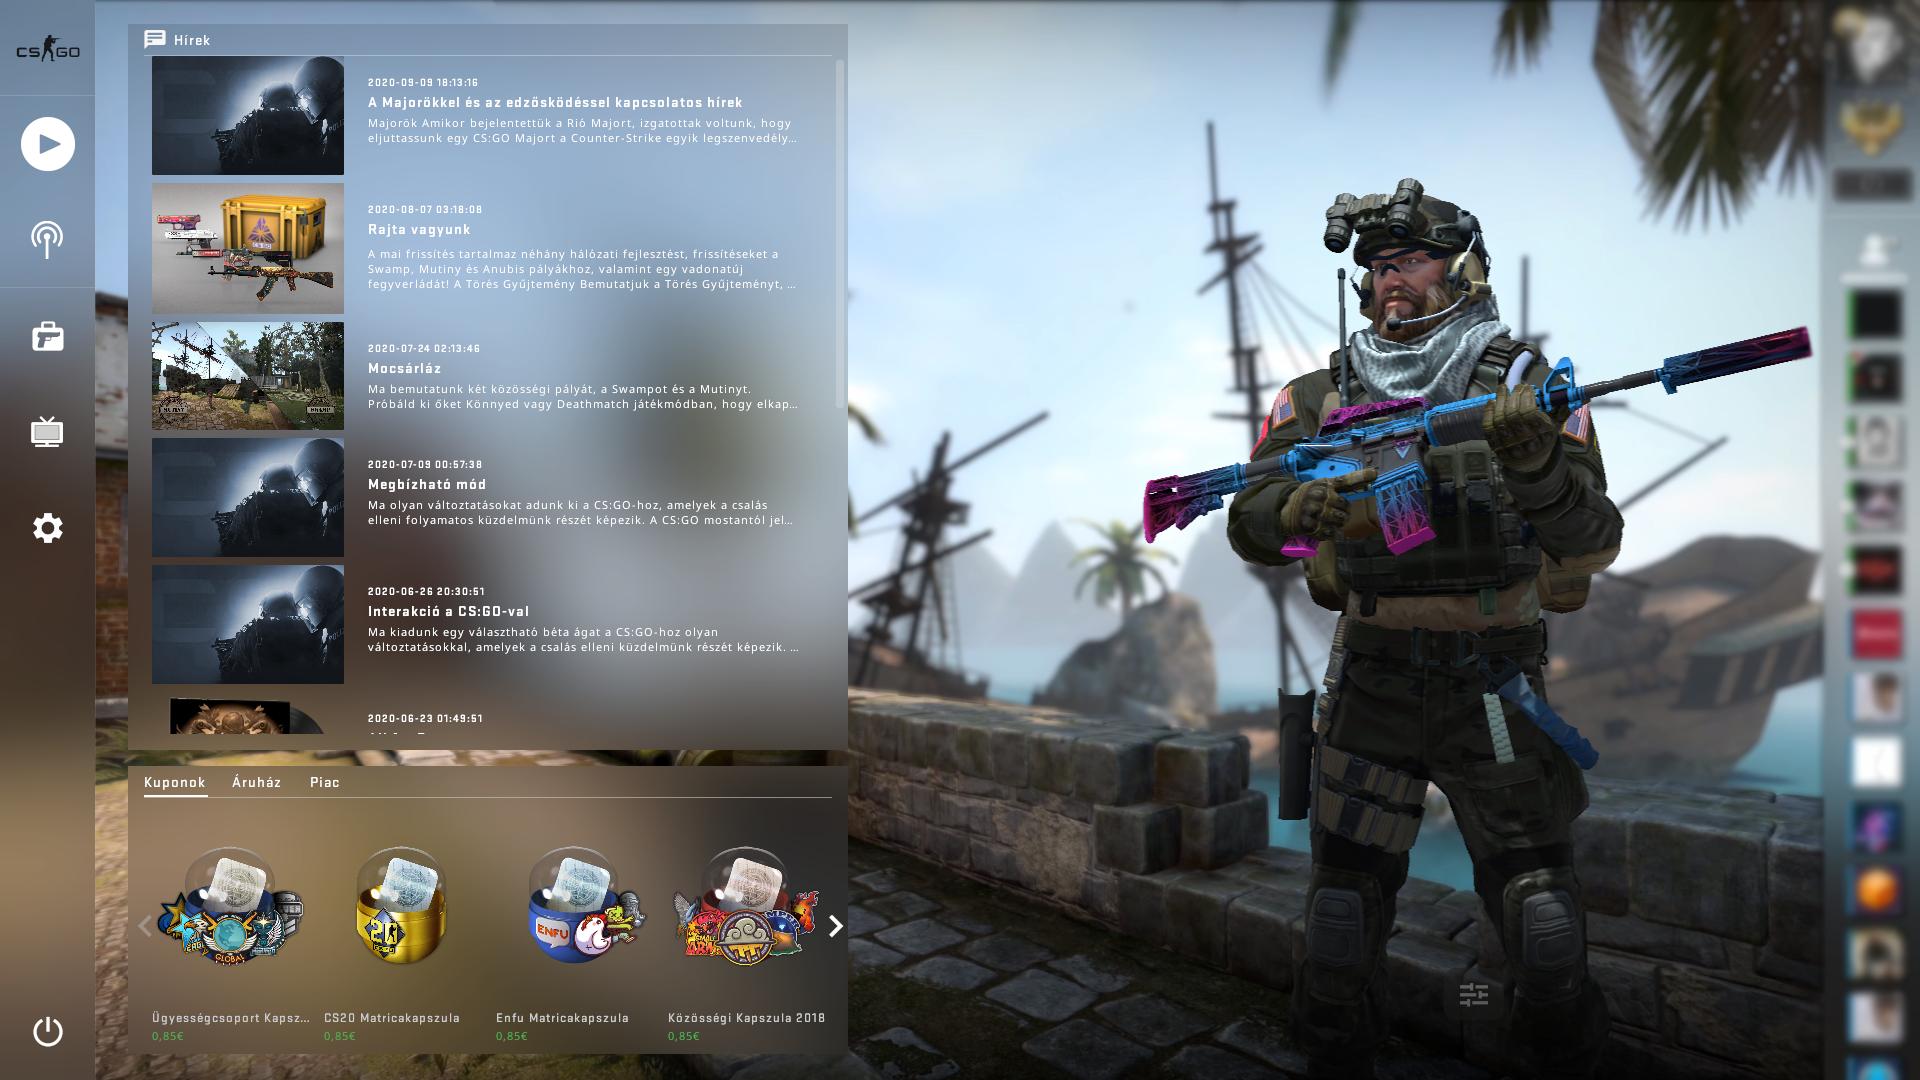 A Panorama UI